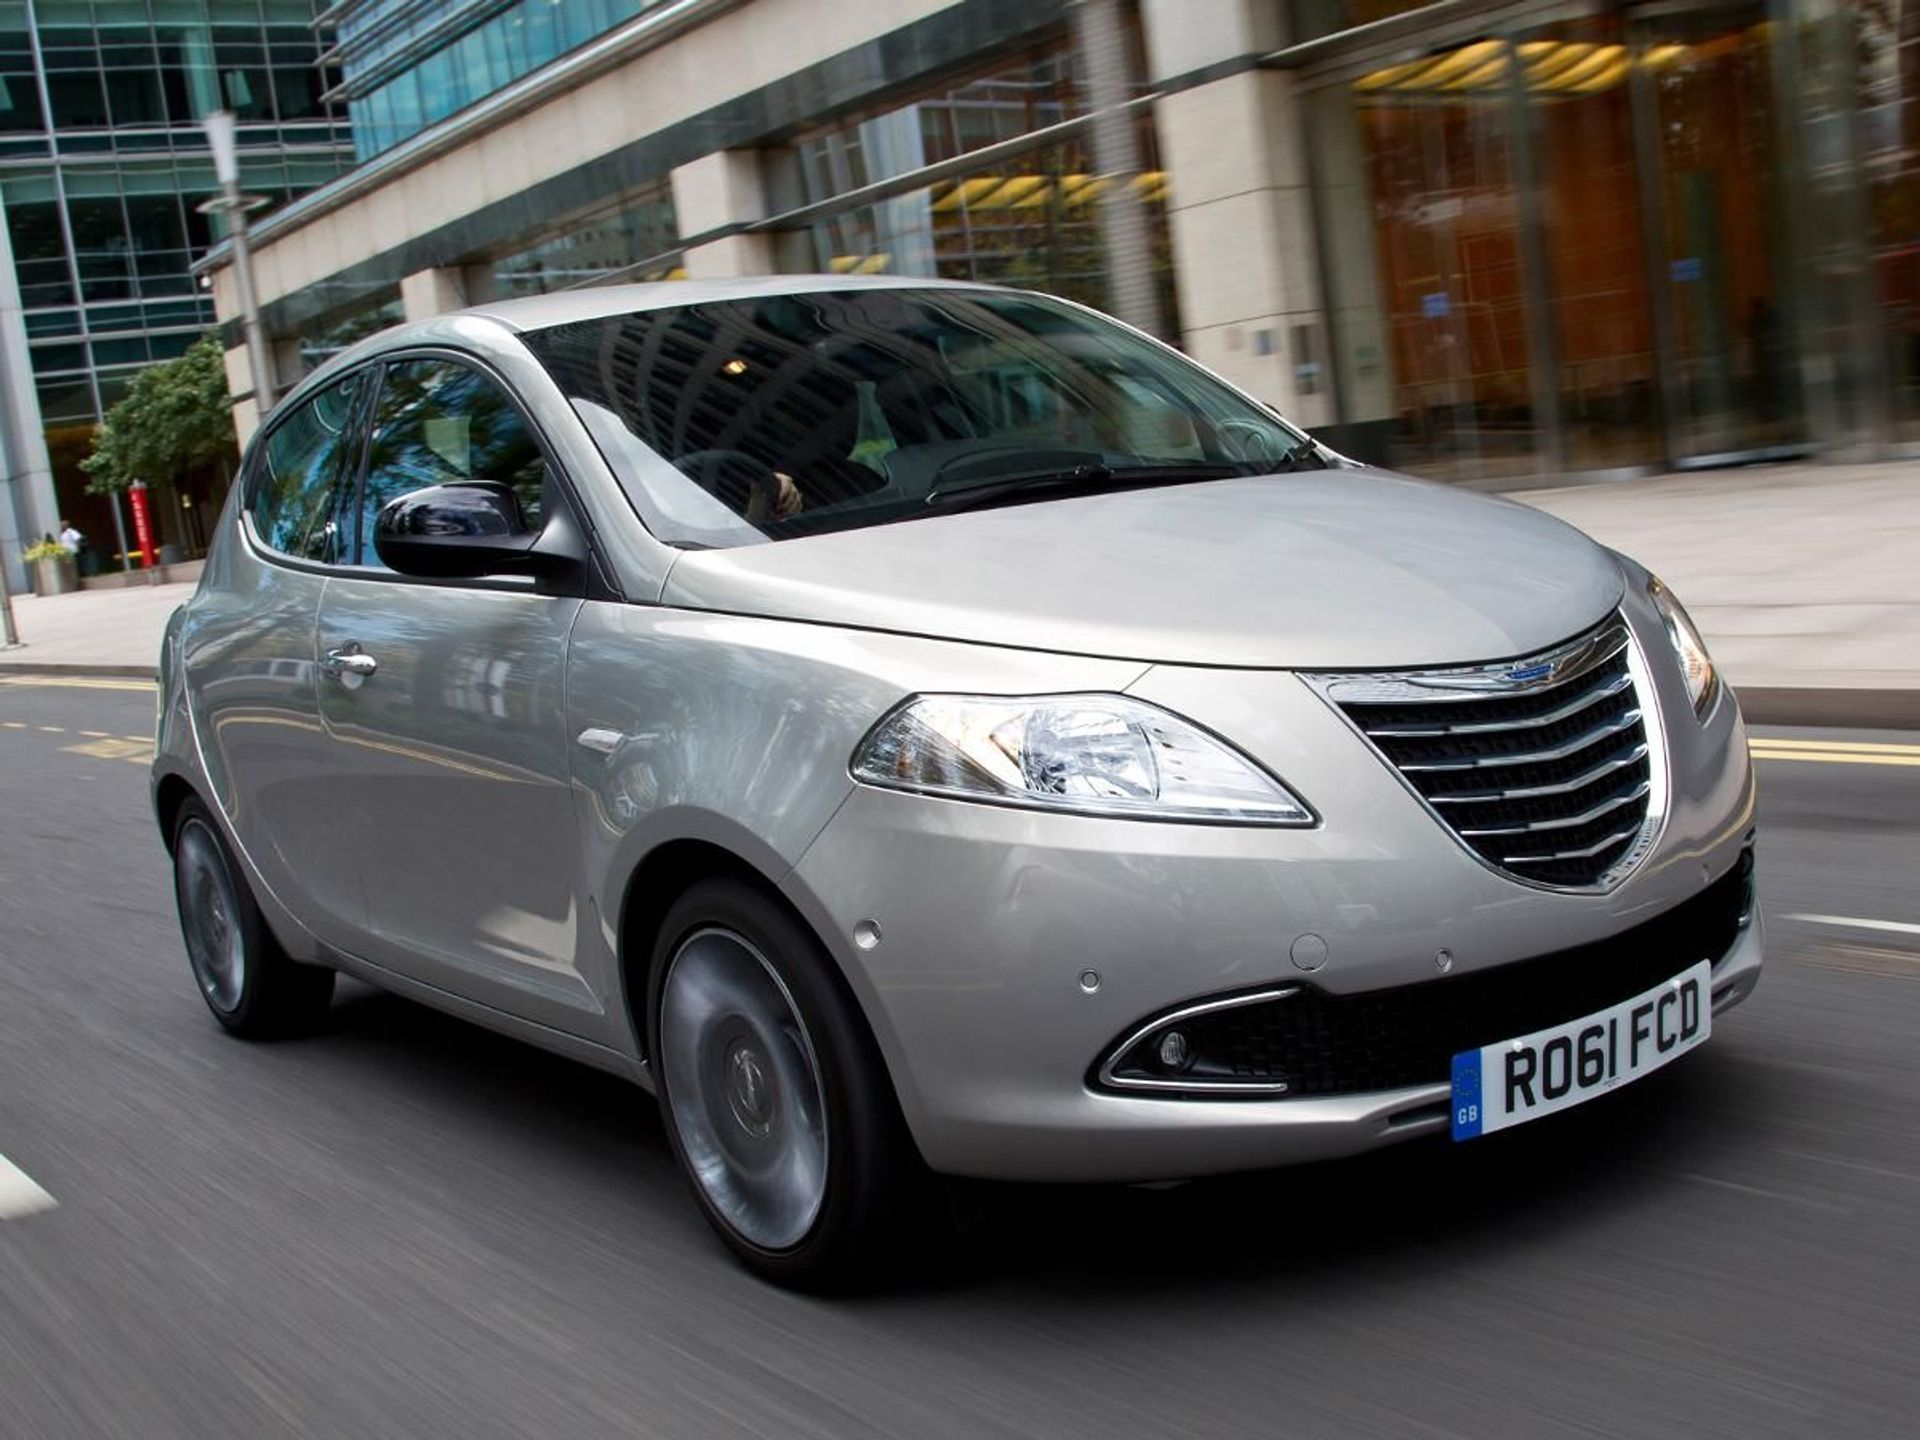 Chrysler Ypsilon  image